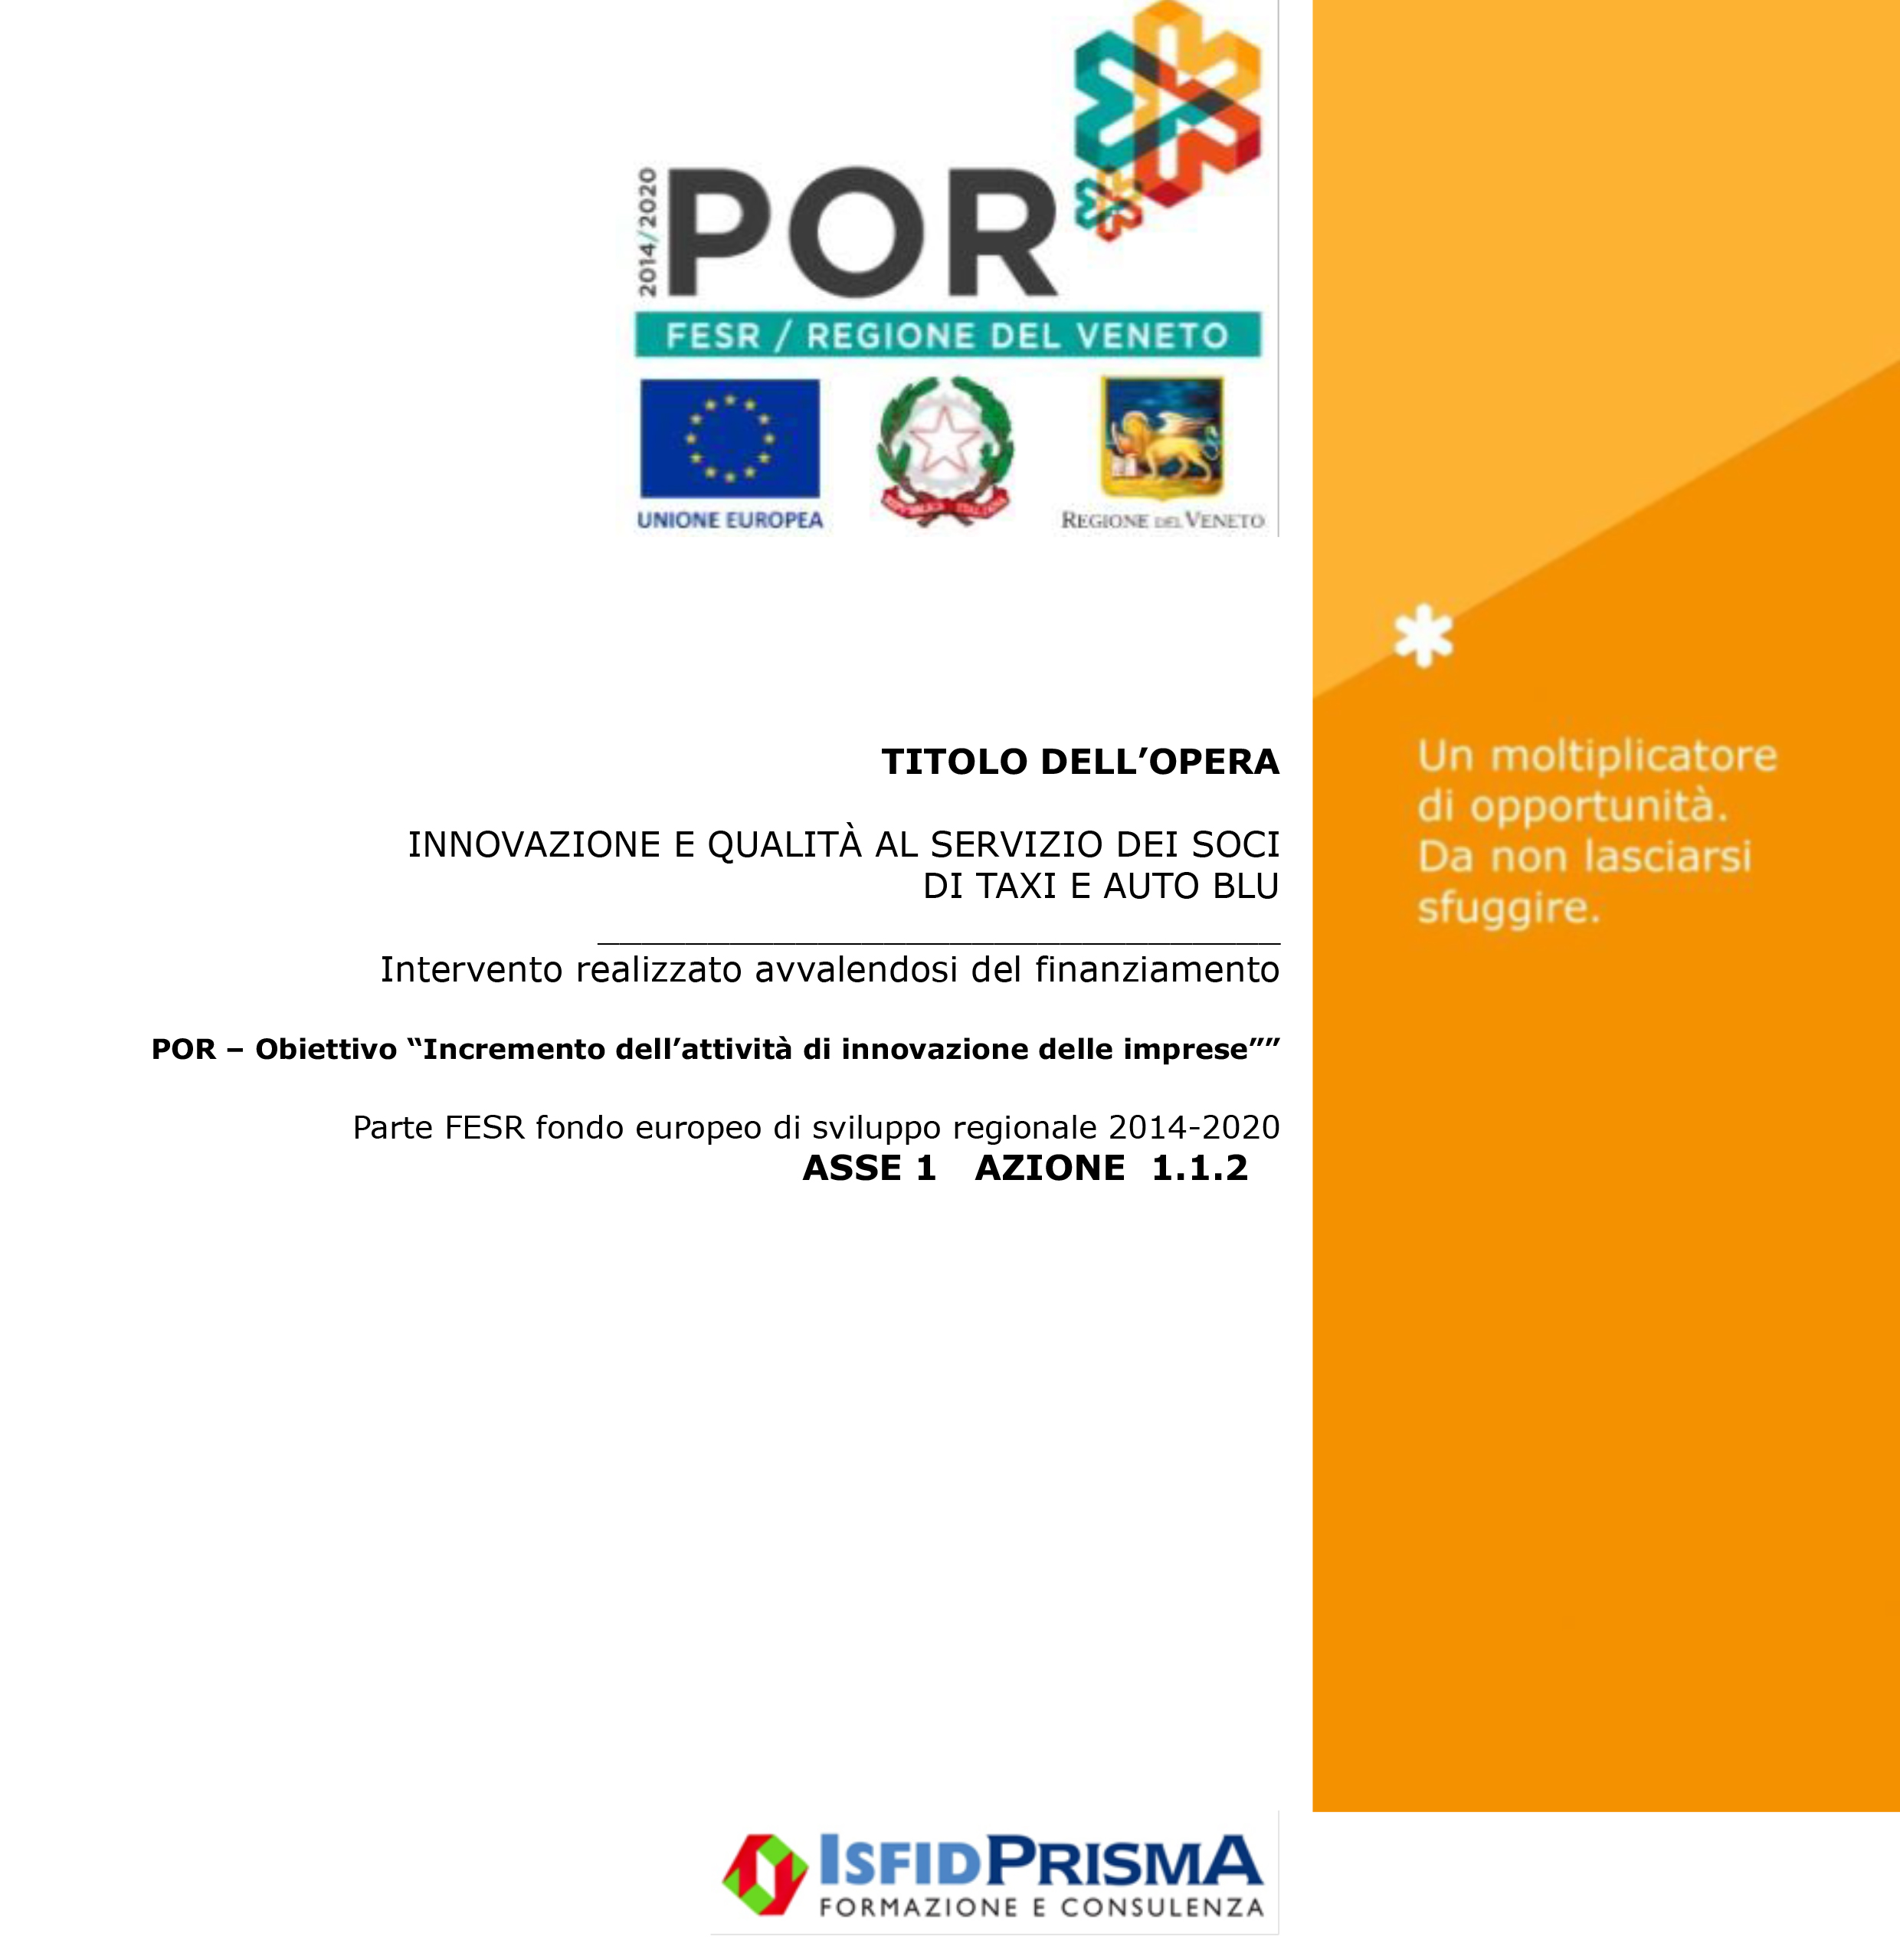 NCC Transfer Verona - taxiautoblu.it - POR FESR/Regione del Veneto